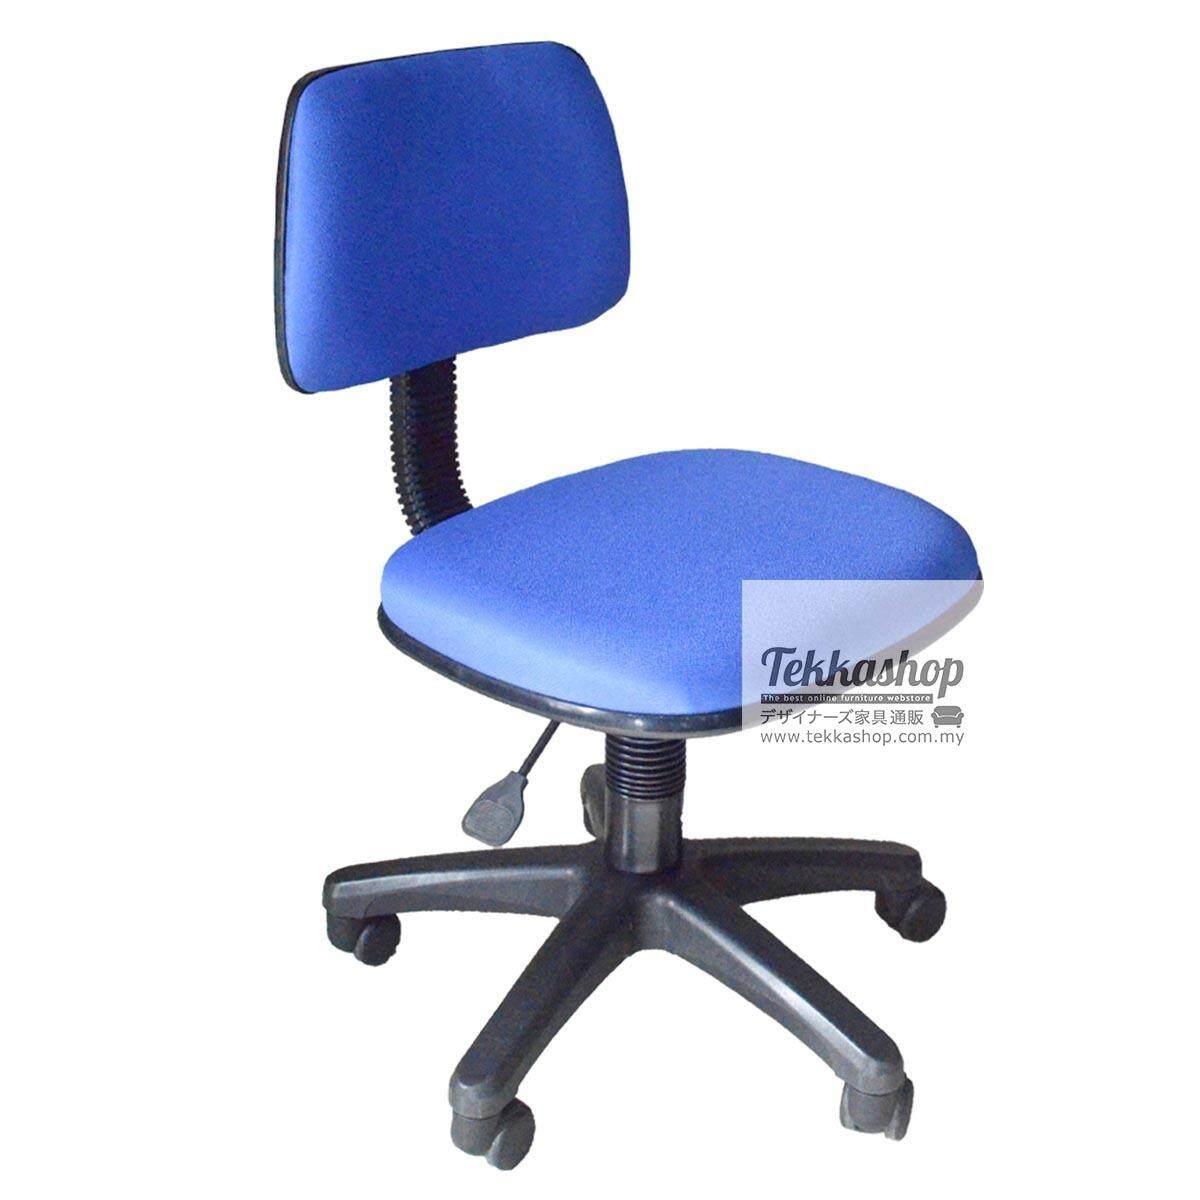 Tekkashop DJ198A Height Adjustable Executive Chair Swivel Office Chair (Blue) 128CM